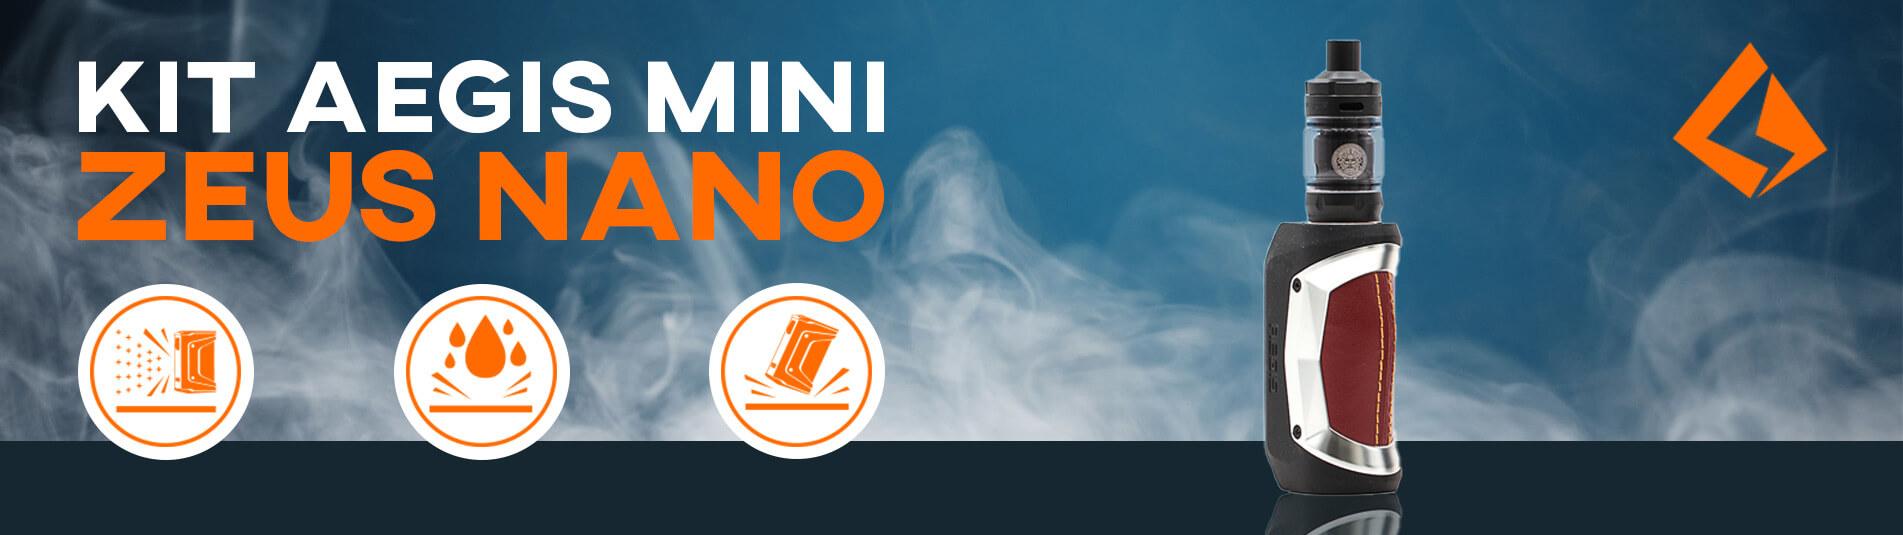 Kit Aegis Mini Zeus Nano GeekVape